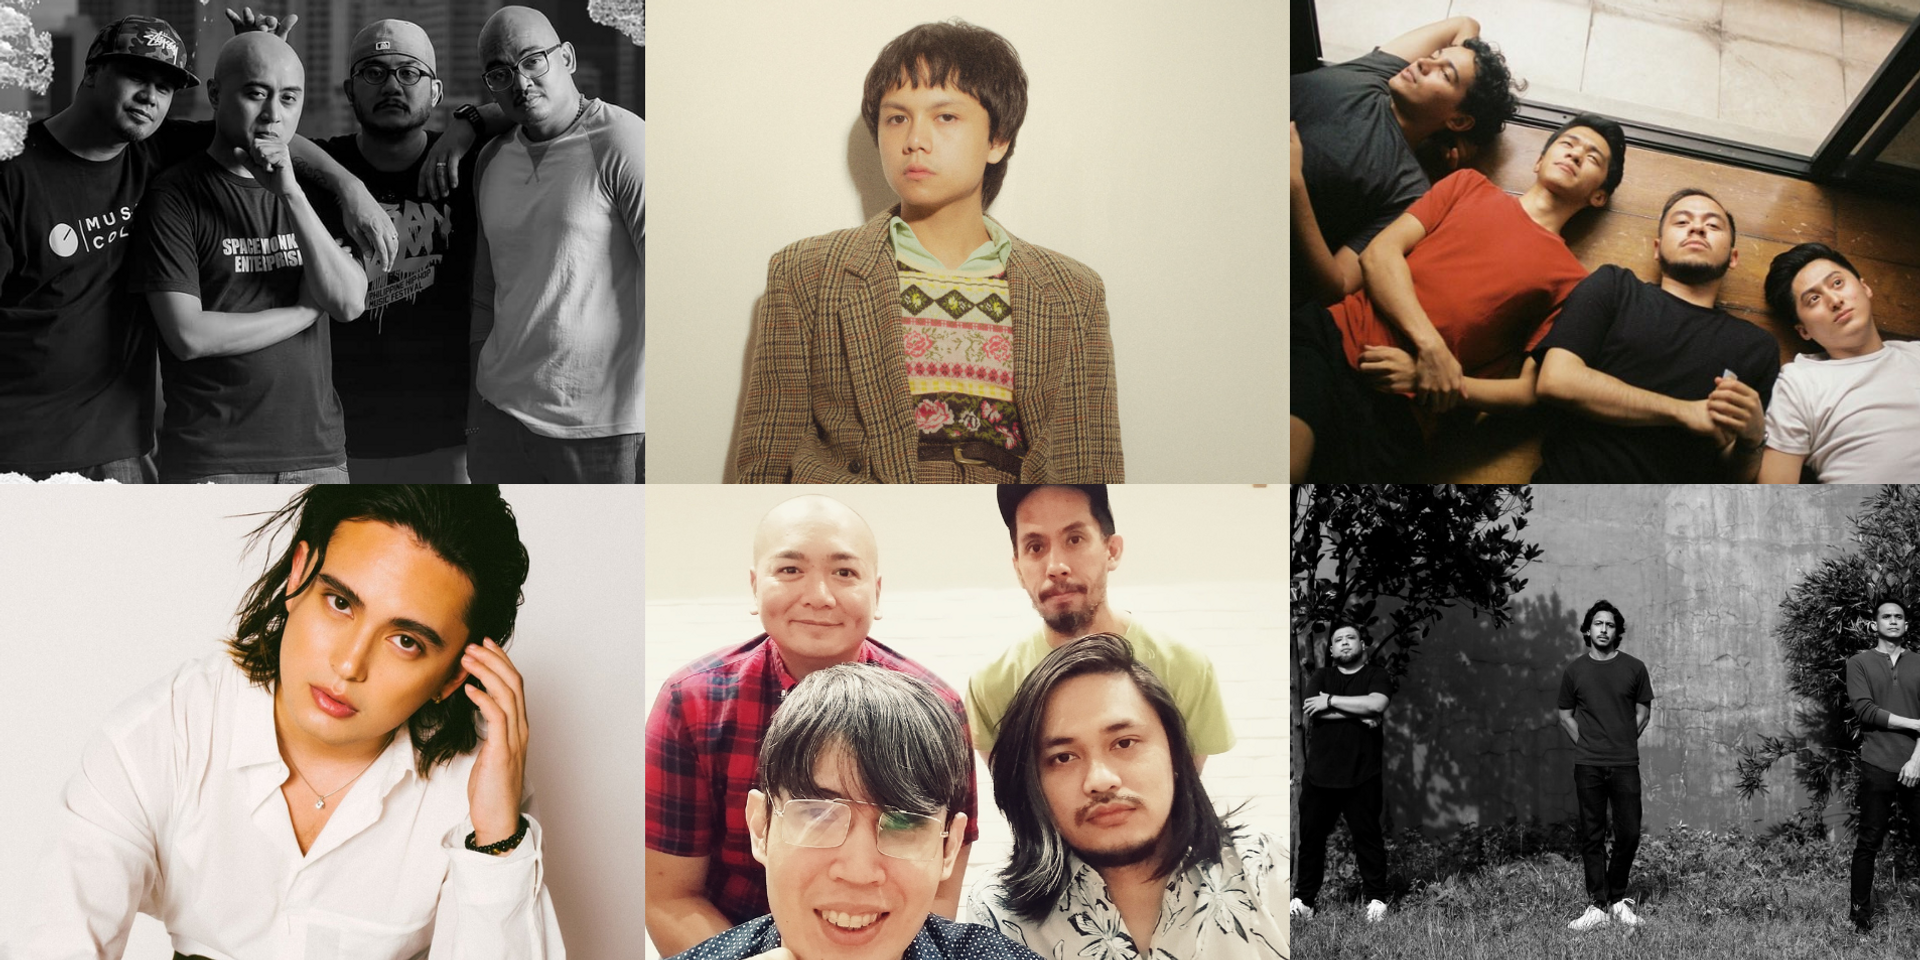 Dicta License, Zild, Ciudad, Sun Valley Crew, and more release new music – listen